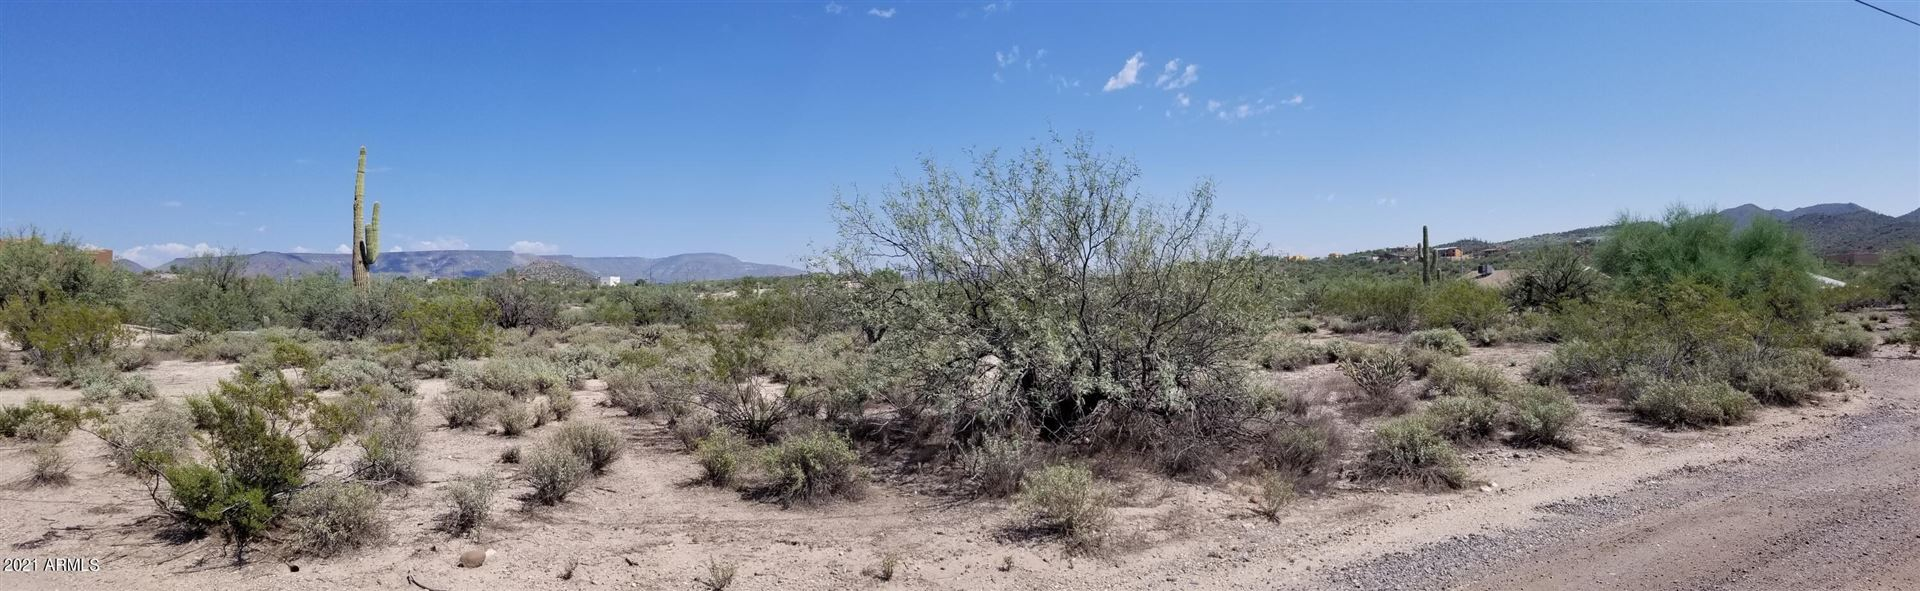 Photo of 20211029 N 29th Avenue, New River, AZ 85087 (MLS # 6291644)